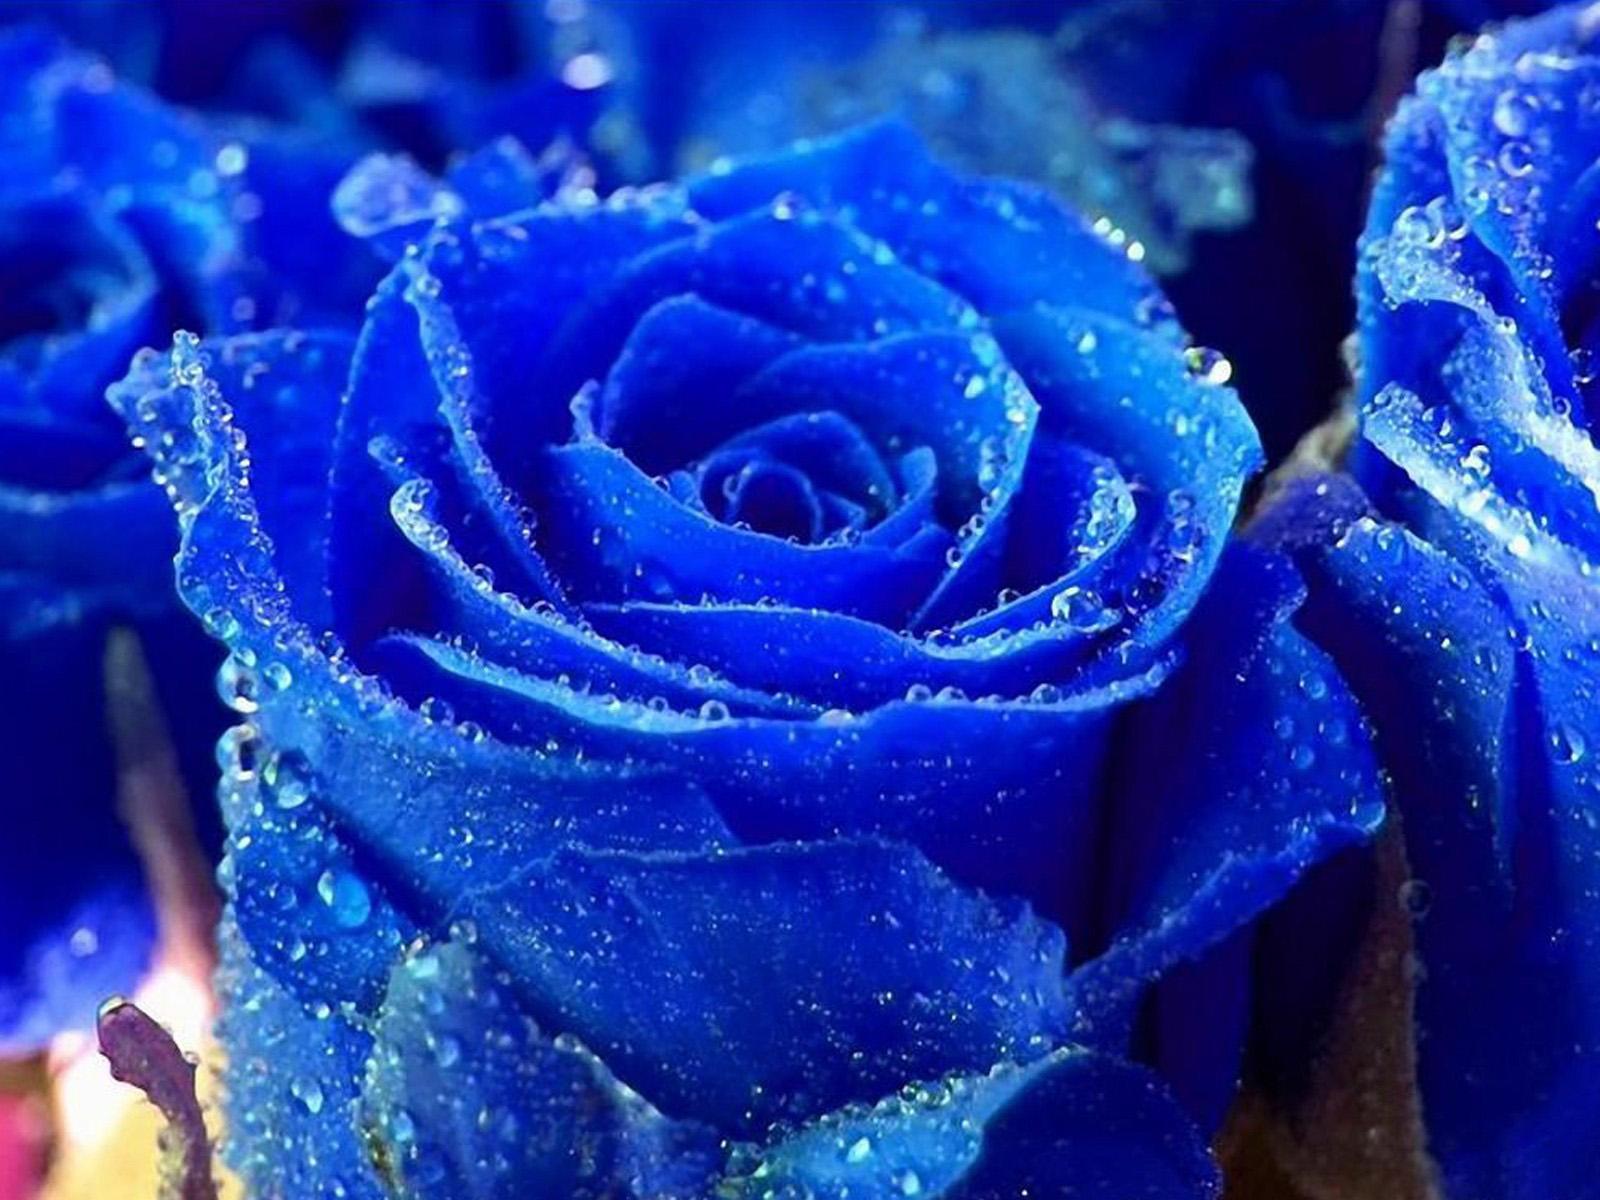 http://1.bp.blogspot.com/-iaT0kcvUEbA/TfRZK8bFLvI/AAAAAAAAA1Y/srMpR69zma0/s1600/The-best-top-desktop-roses-wallpapers-hd-rose-wallpaper-4-blue-roses.jpg